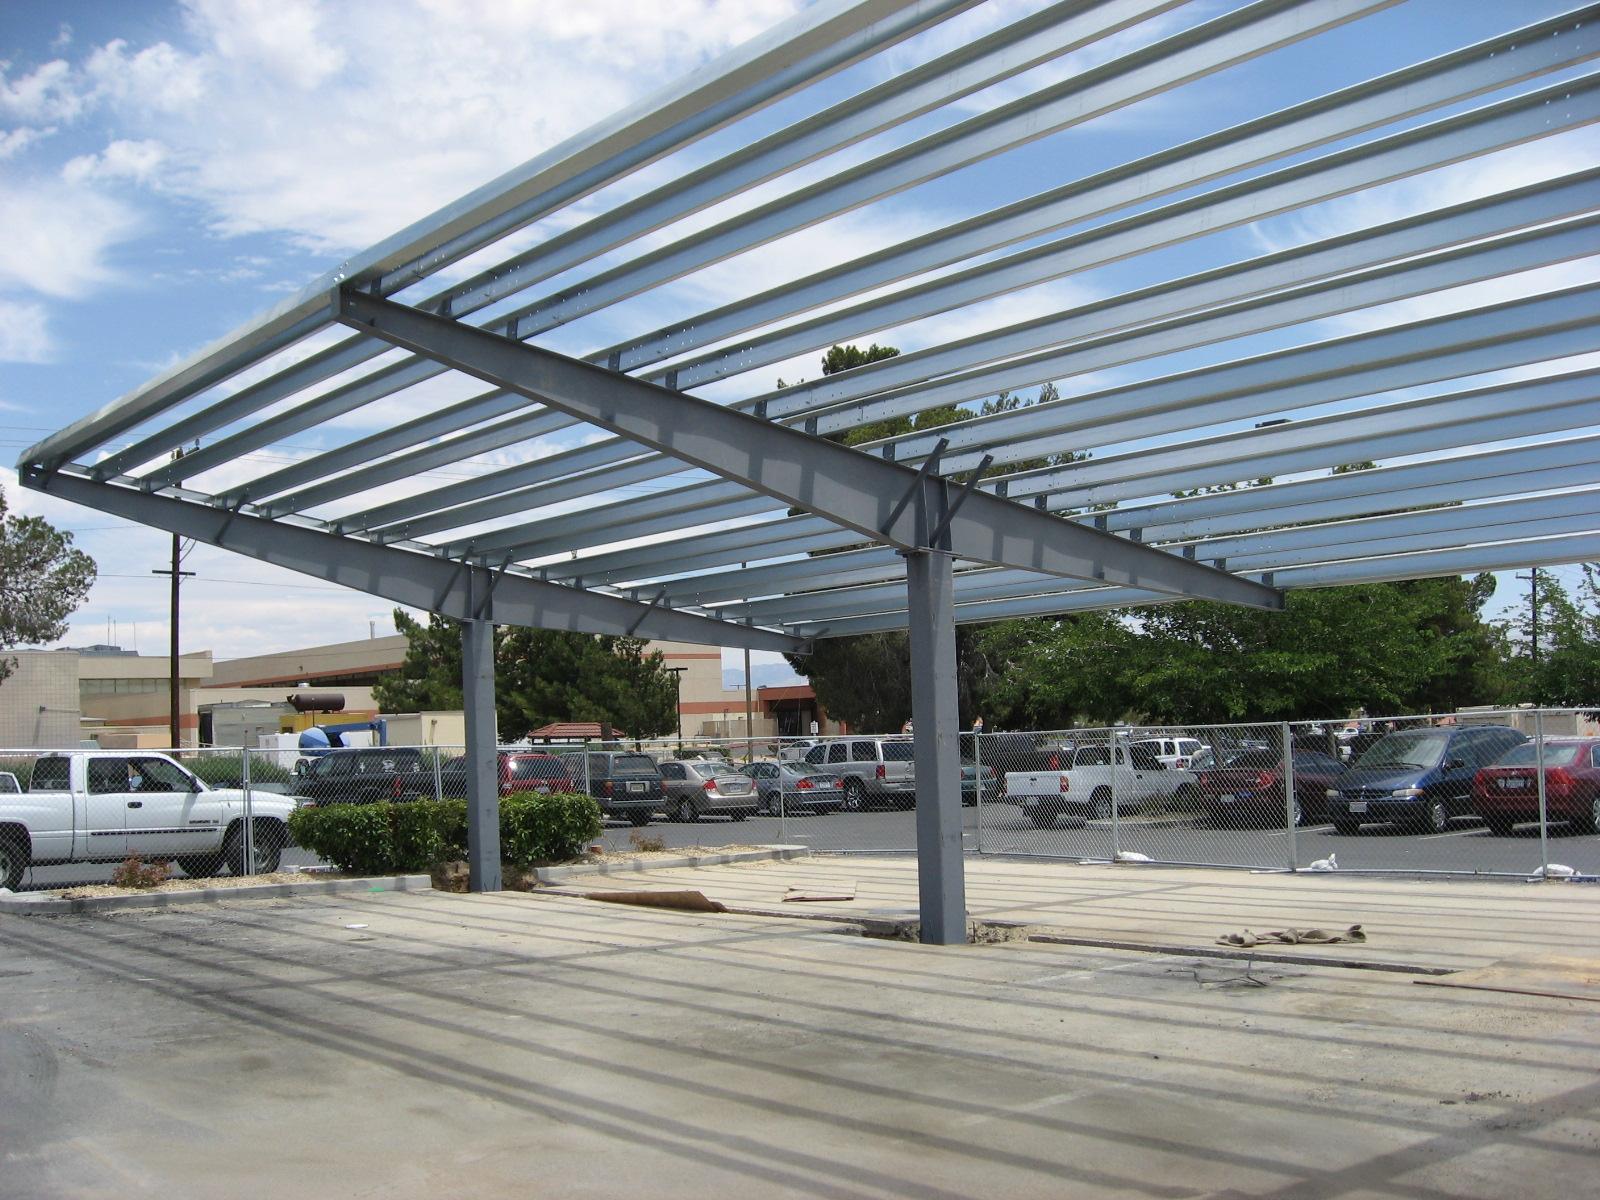 Metal Carport Structures : Steel carports solar structures pascal buildings